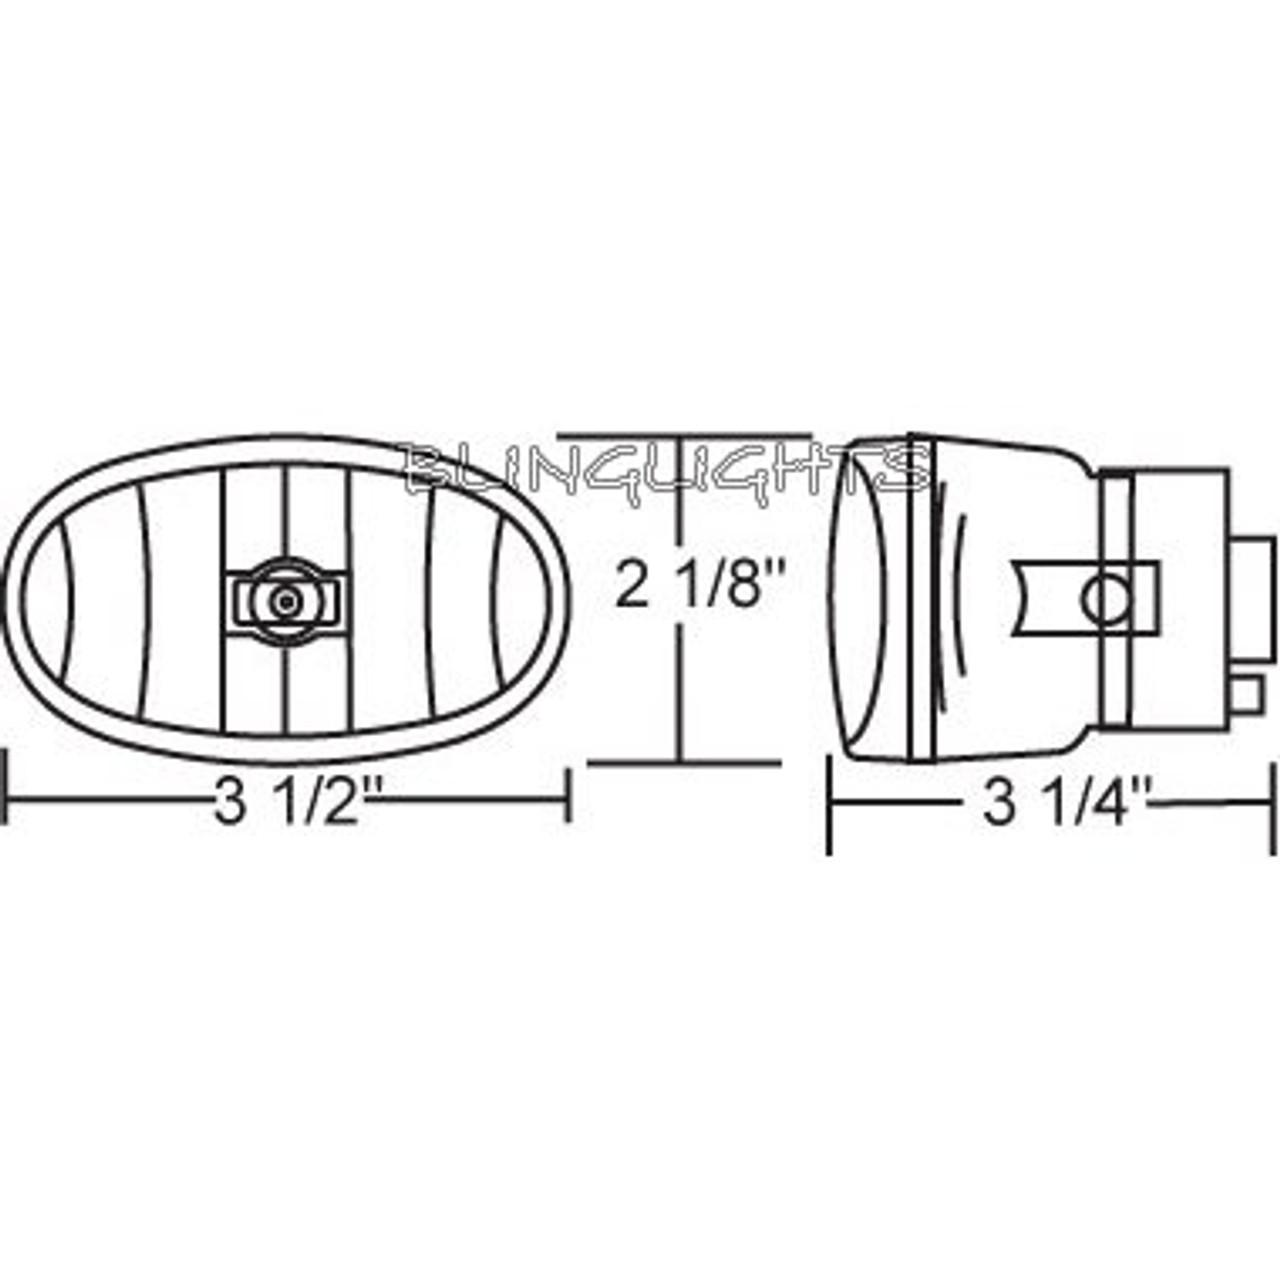 Vn750 Headlight Wiring Diagram | Wiring Diagrams on